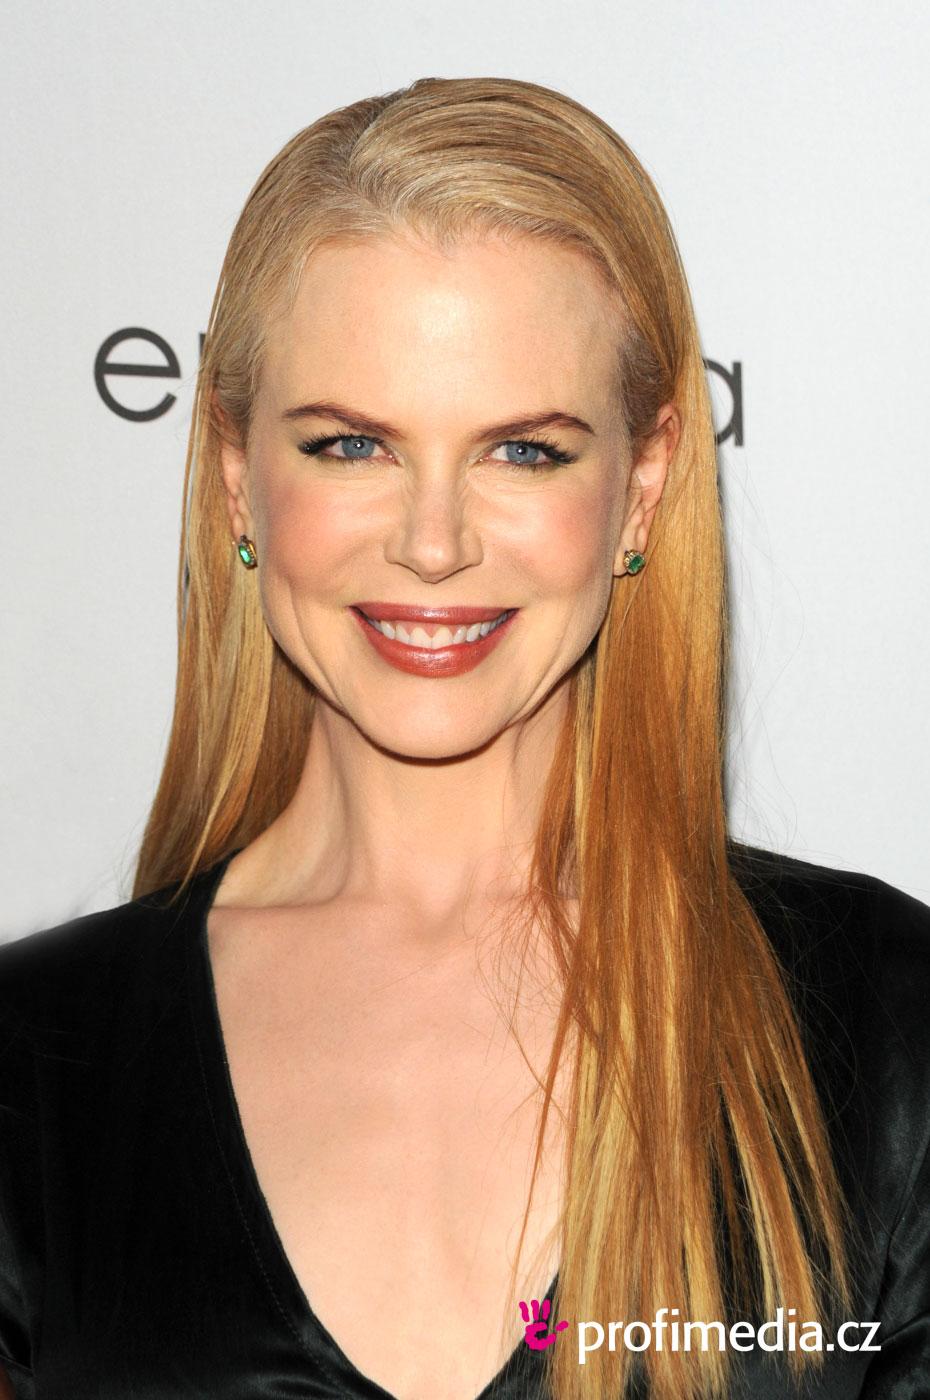 Prom hairstyle - Nicole Kidman - Nicole Kidman